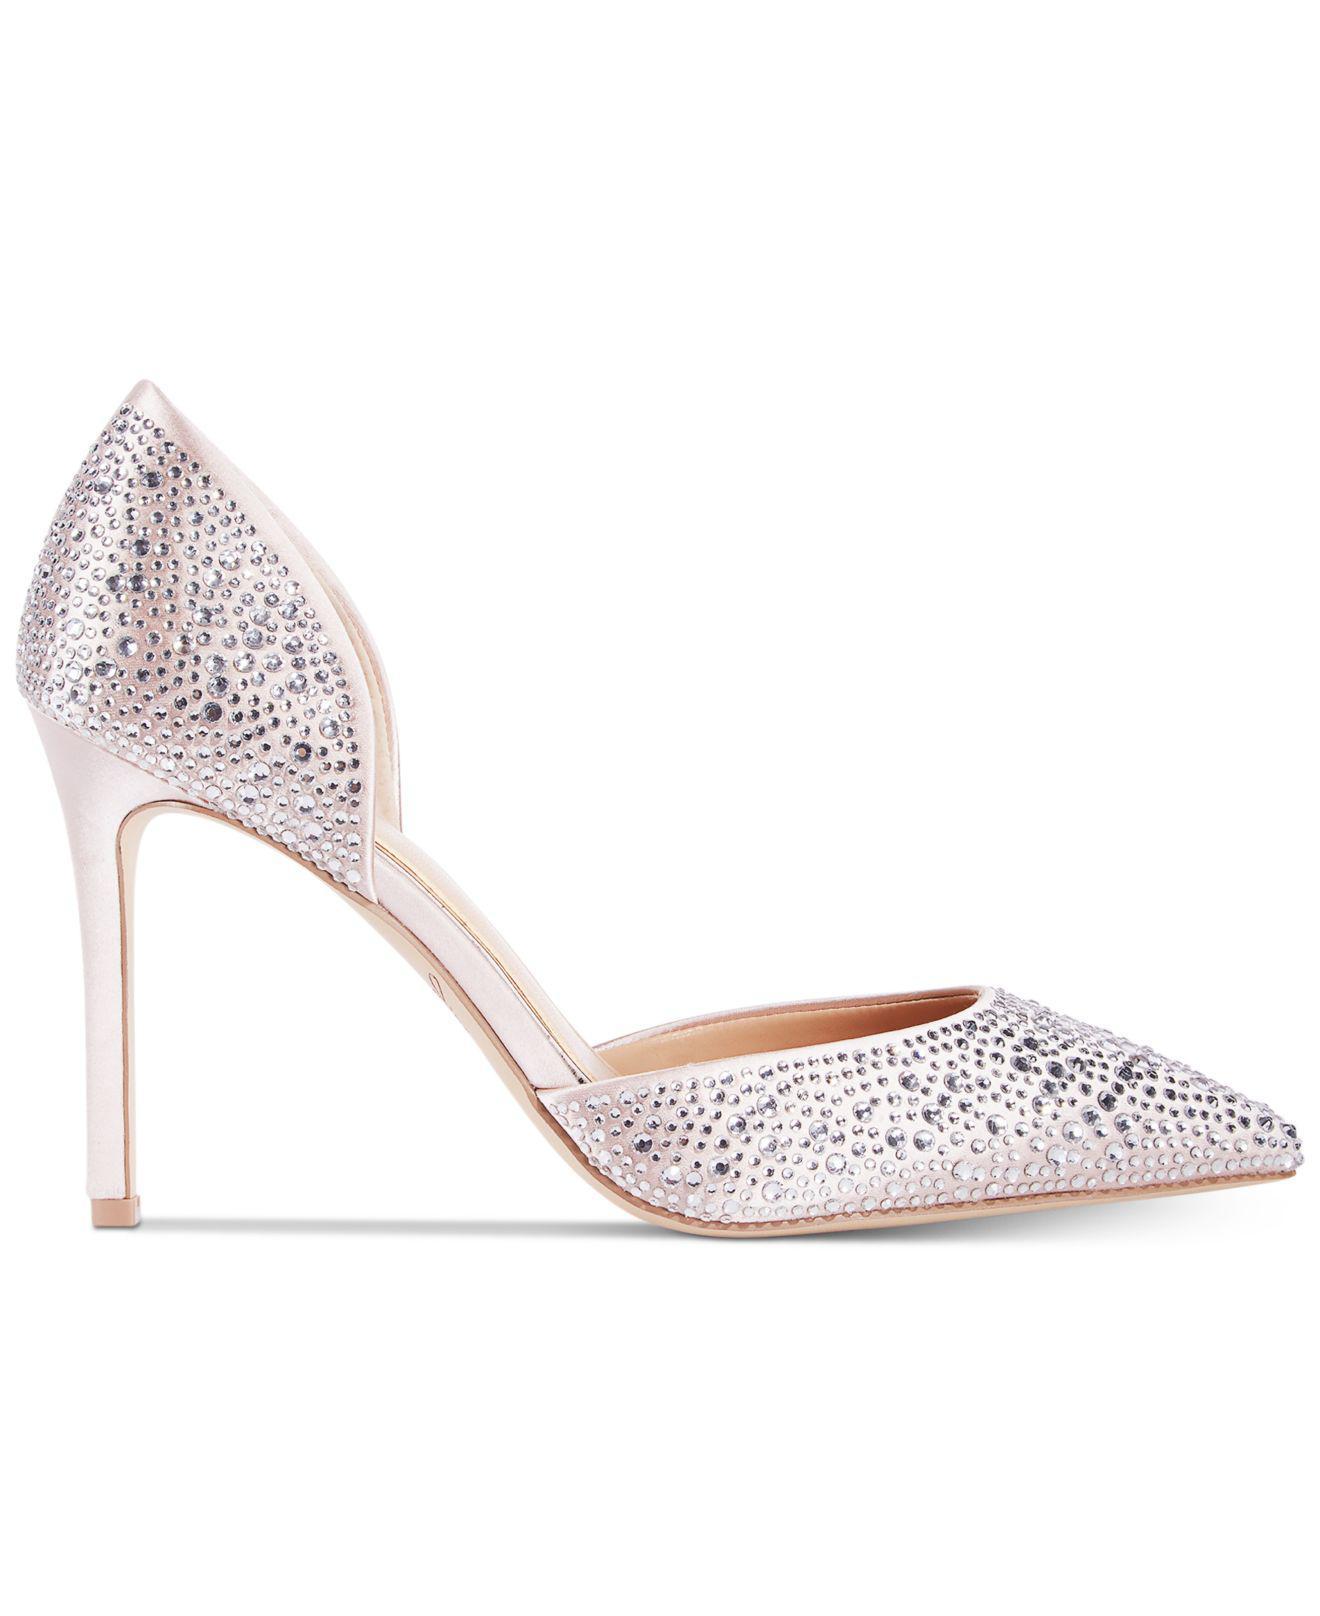 Jewel Badgley Mischka Womens Alexandra Satin Rhinestone Pointed Toe Heels